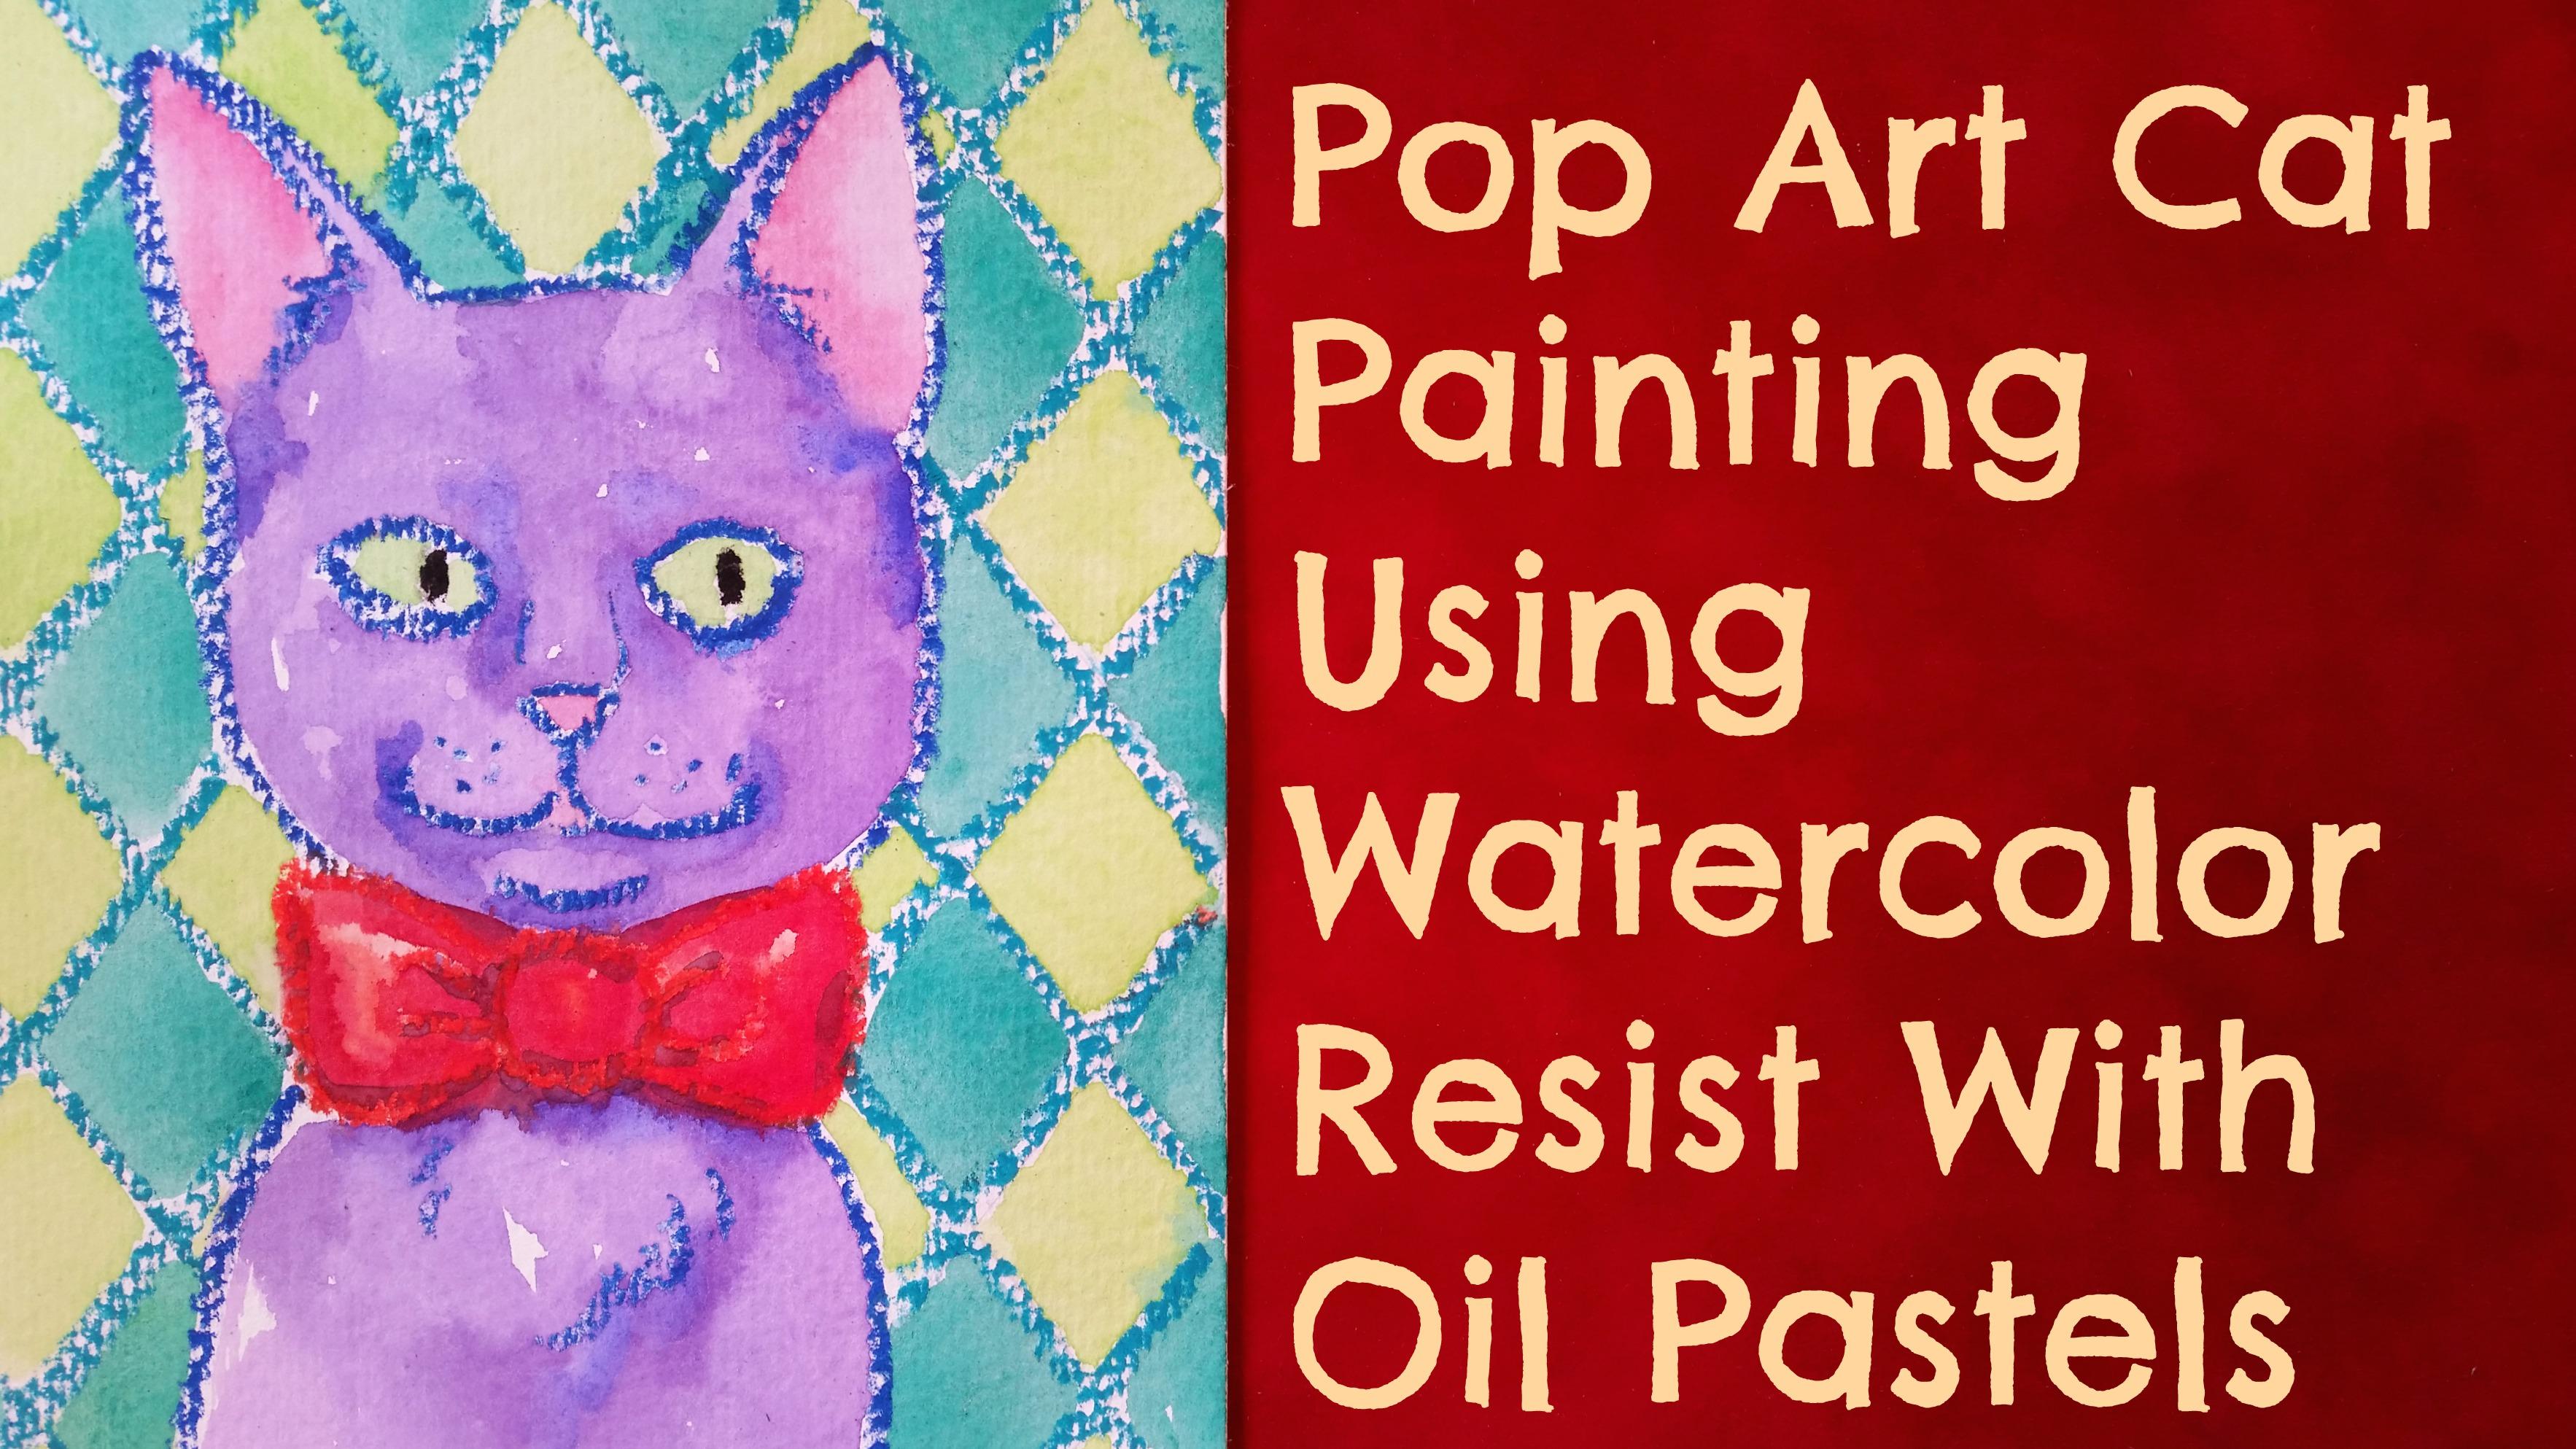 Pop Art Cat Painting Using Watercolor Resist Art Supply